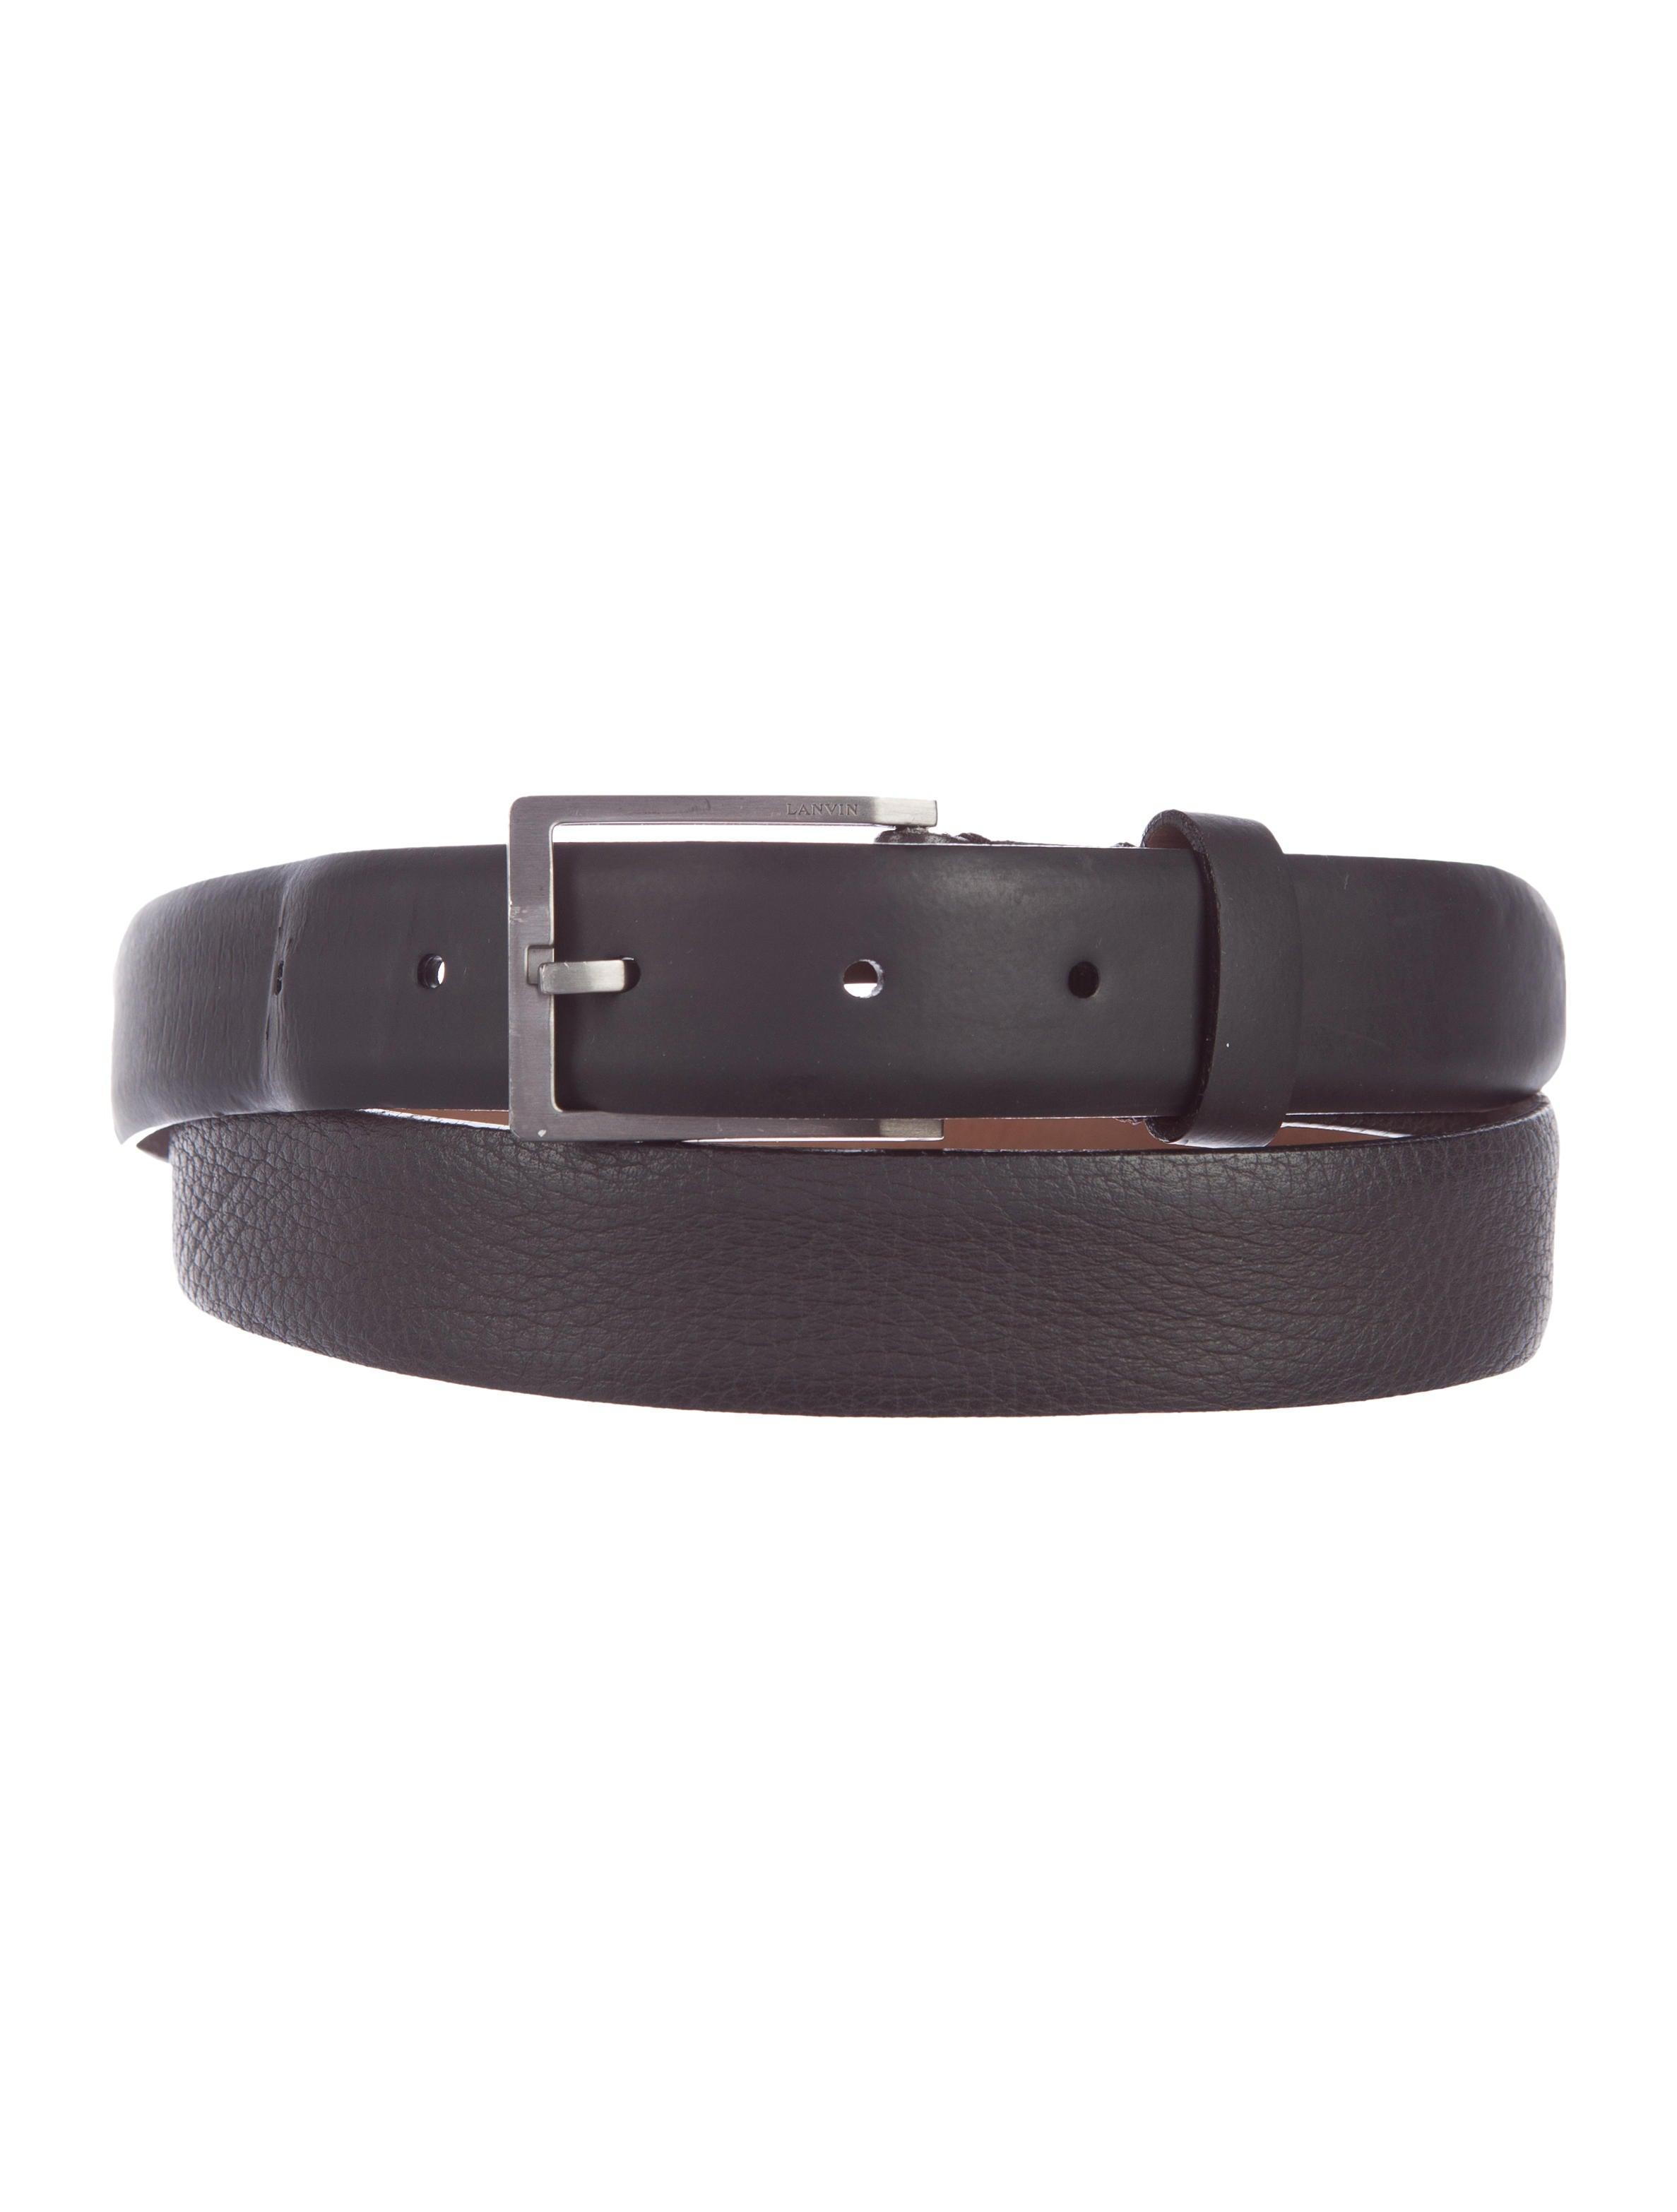 lanvin leather dress belt accessories lan54693 the